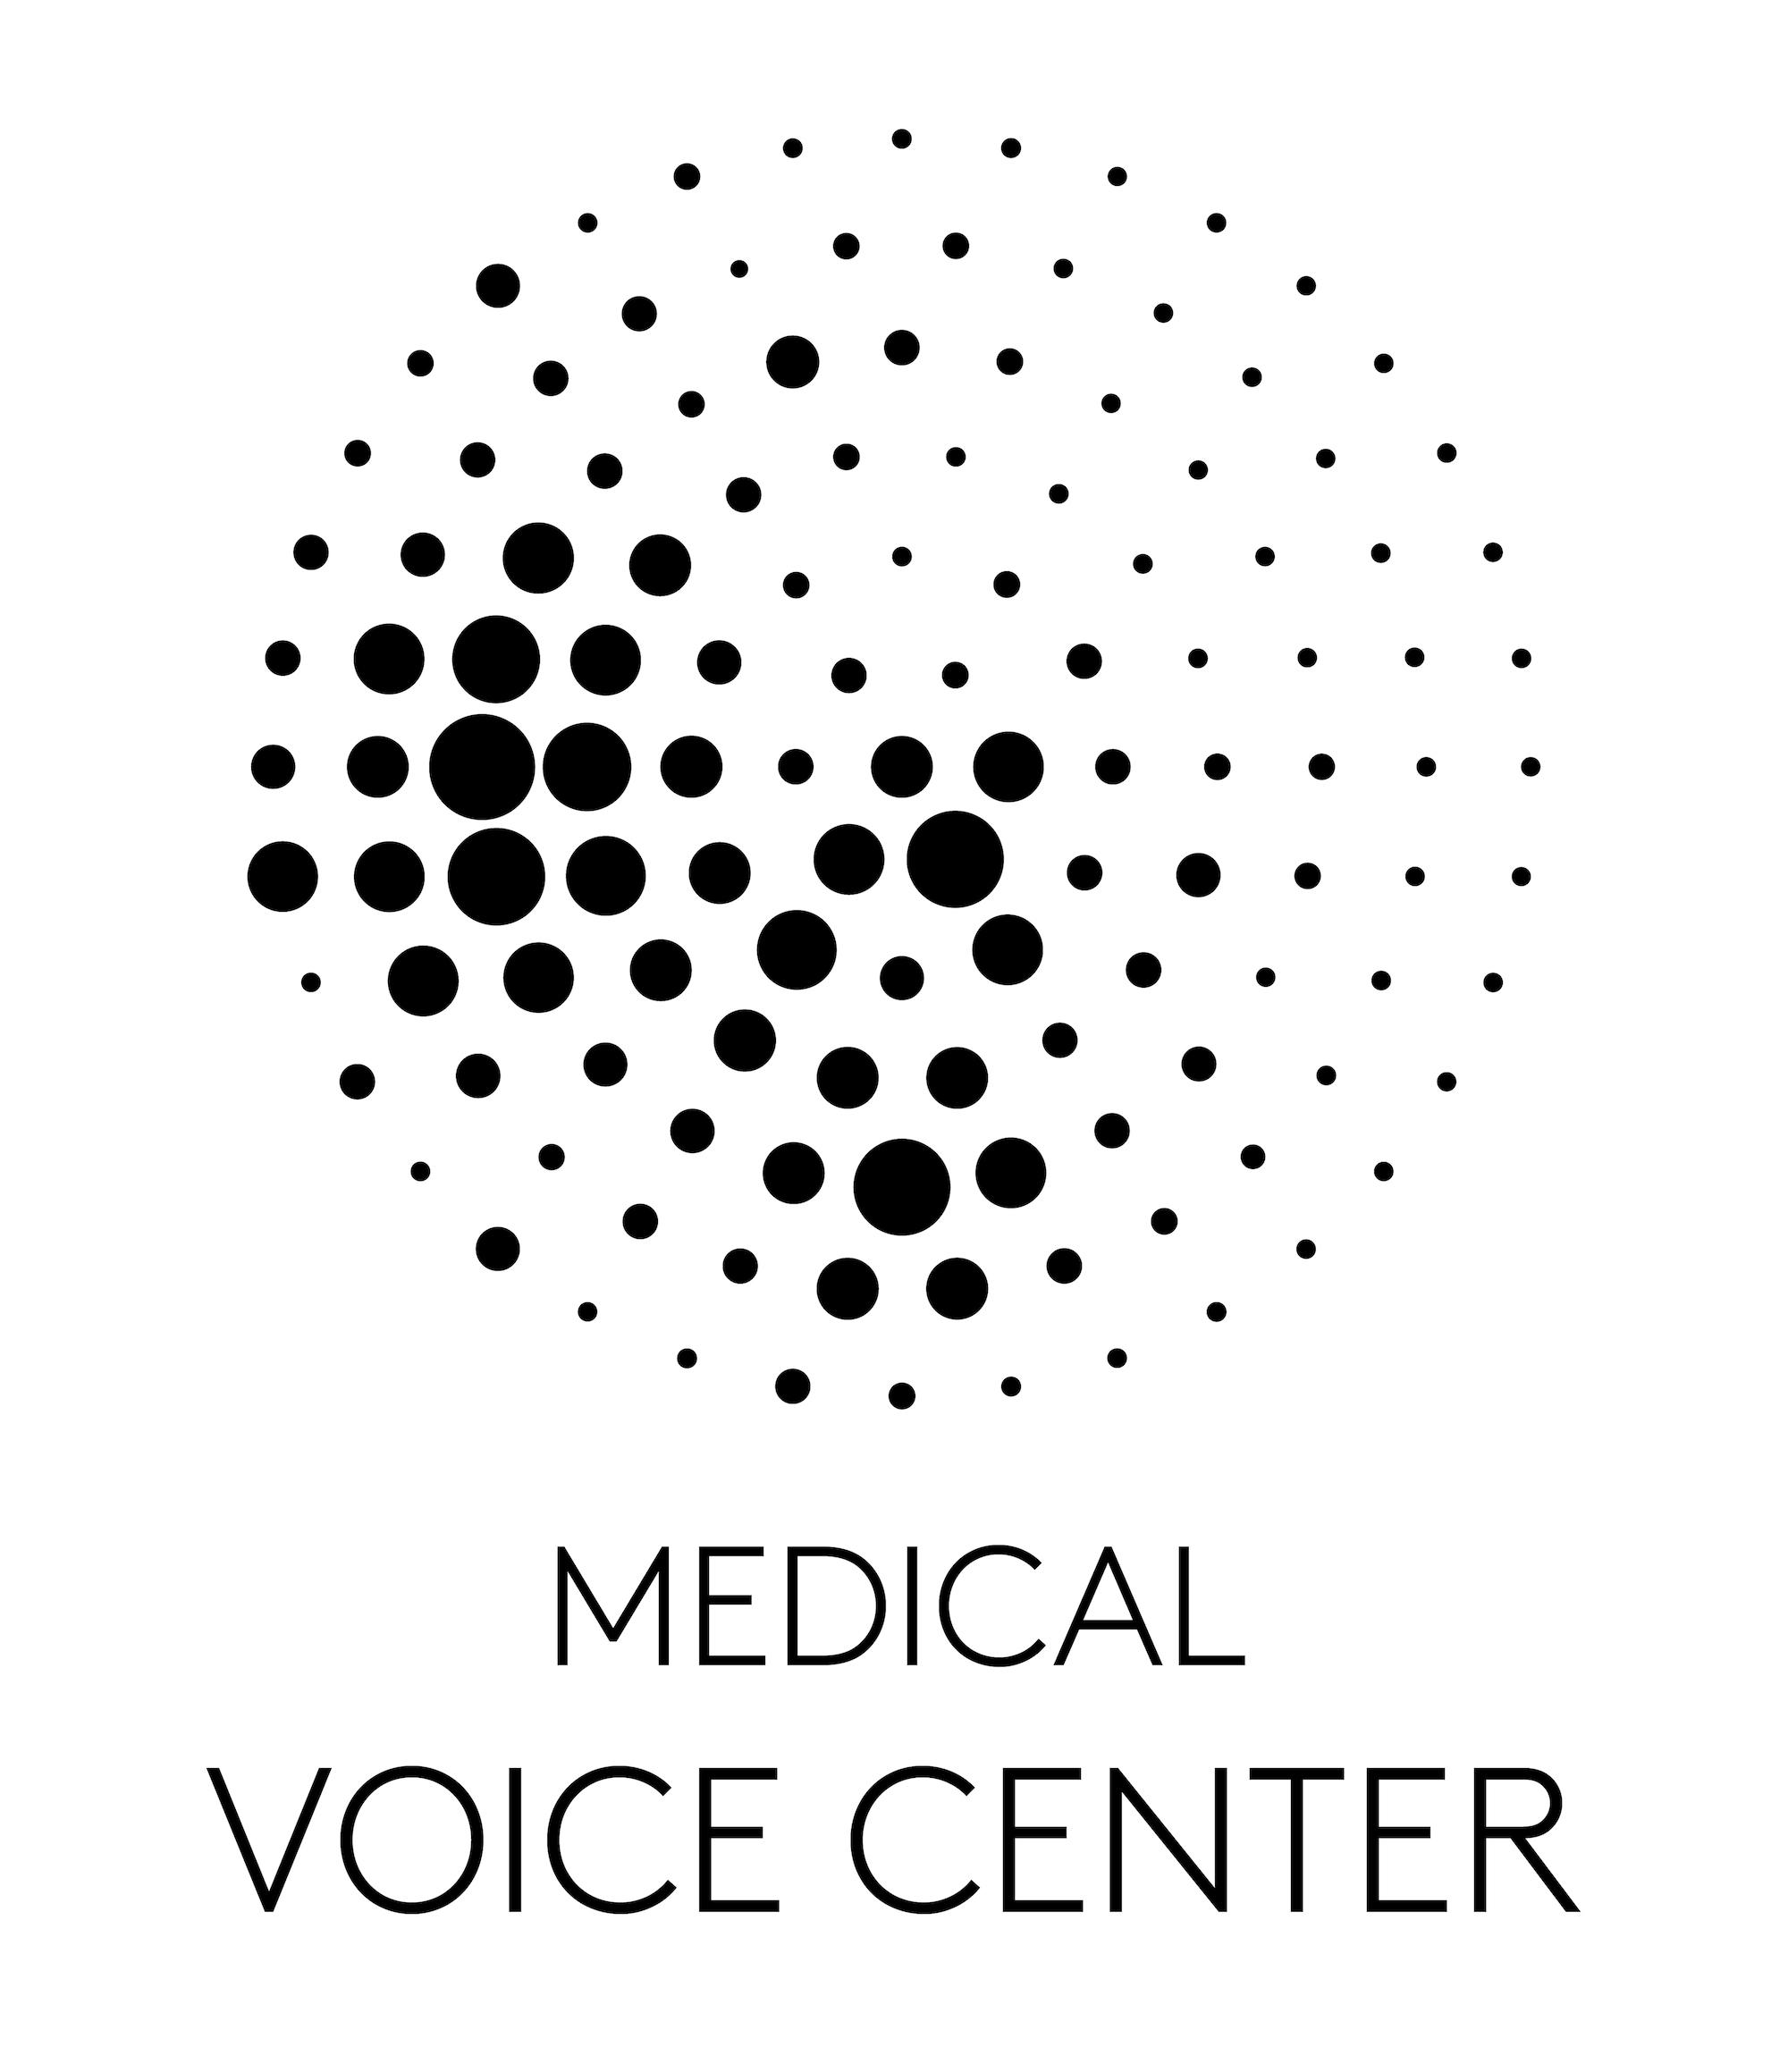 MEDICAL VOICE CENTER